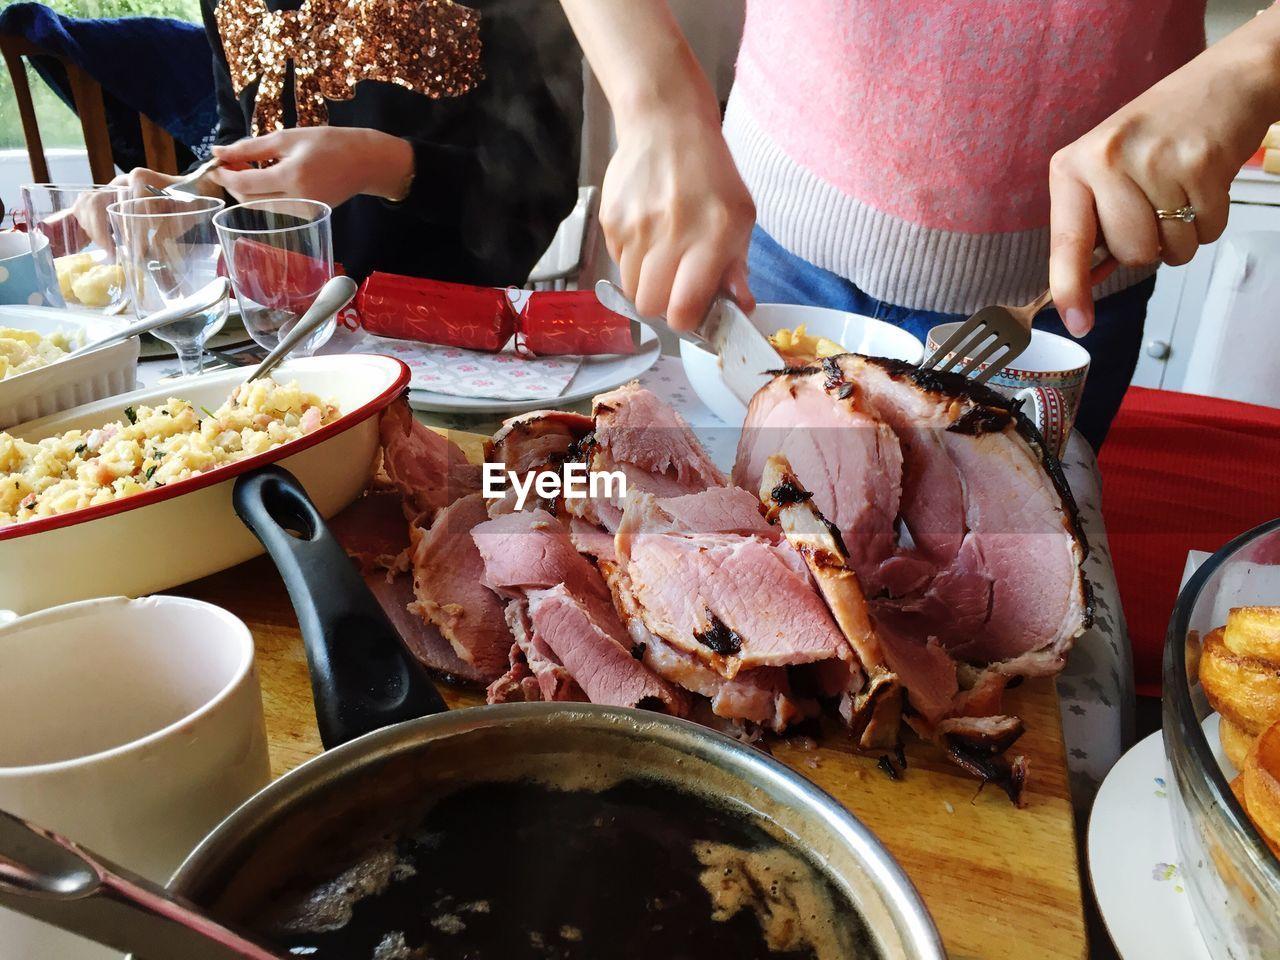 Woman Carving Ham